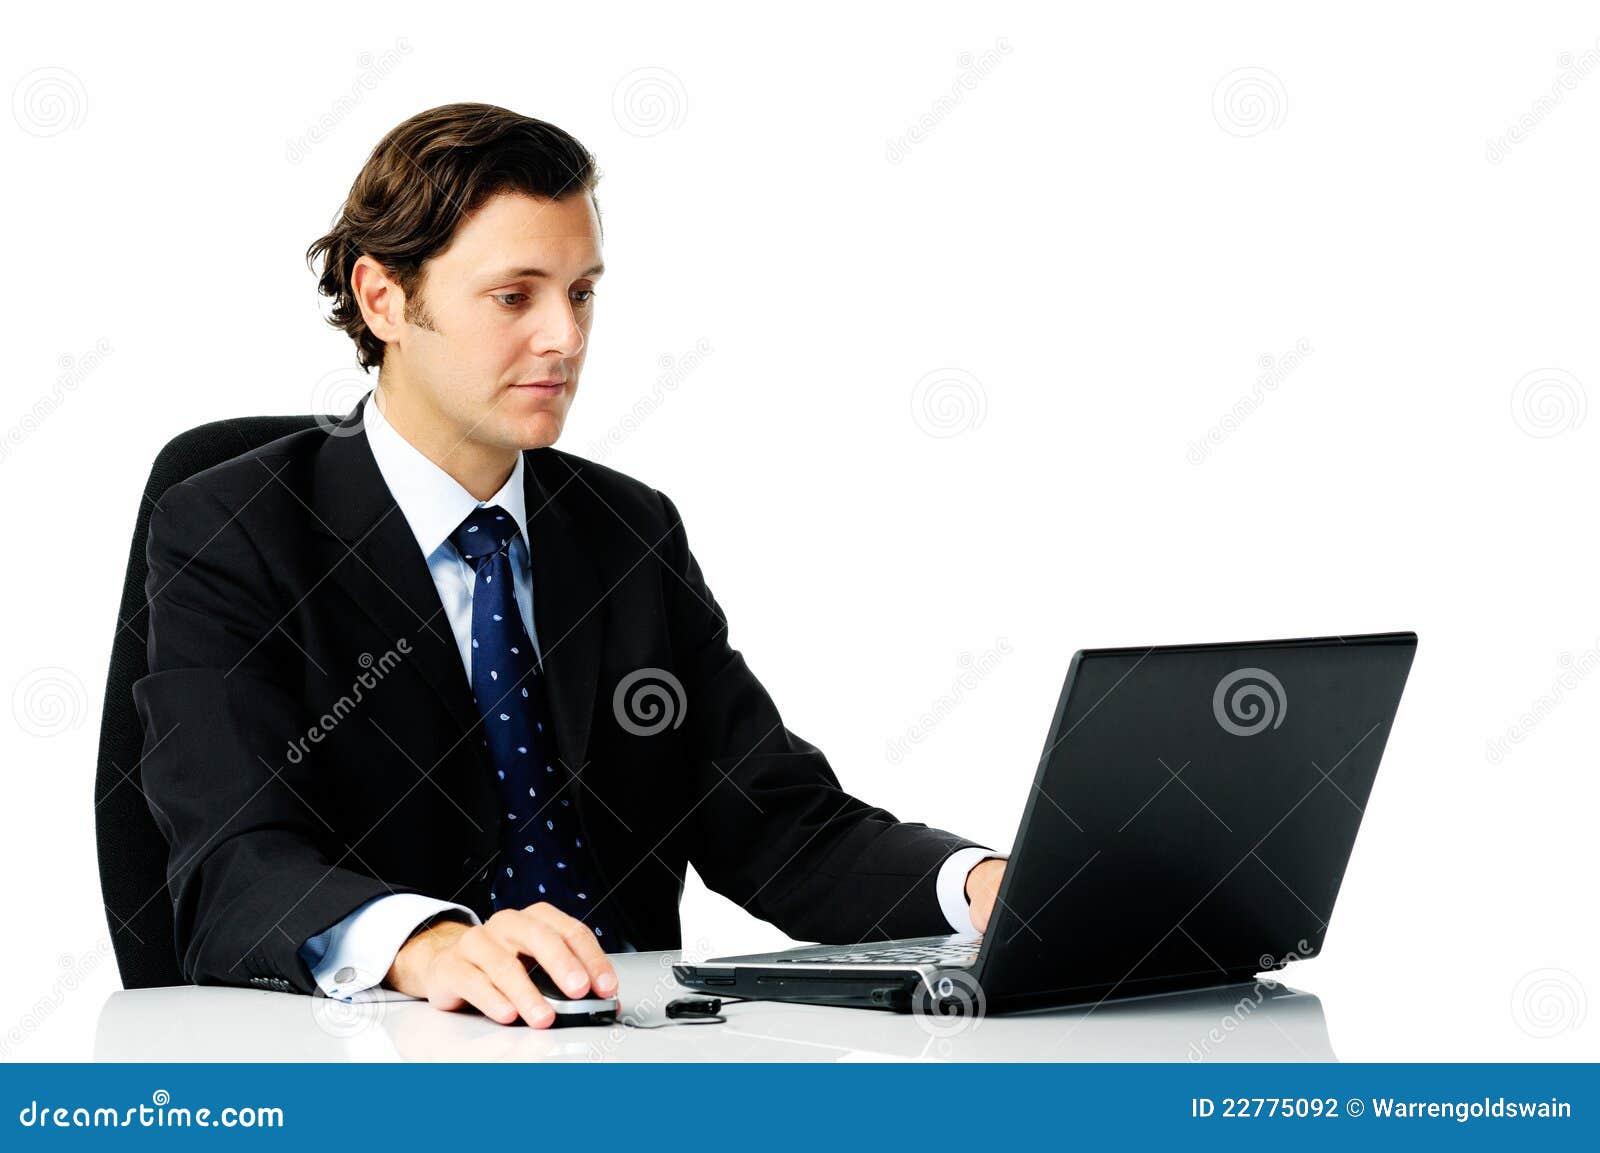 Hardworking Businessman Stock Photography - Image: 22775092